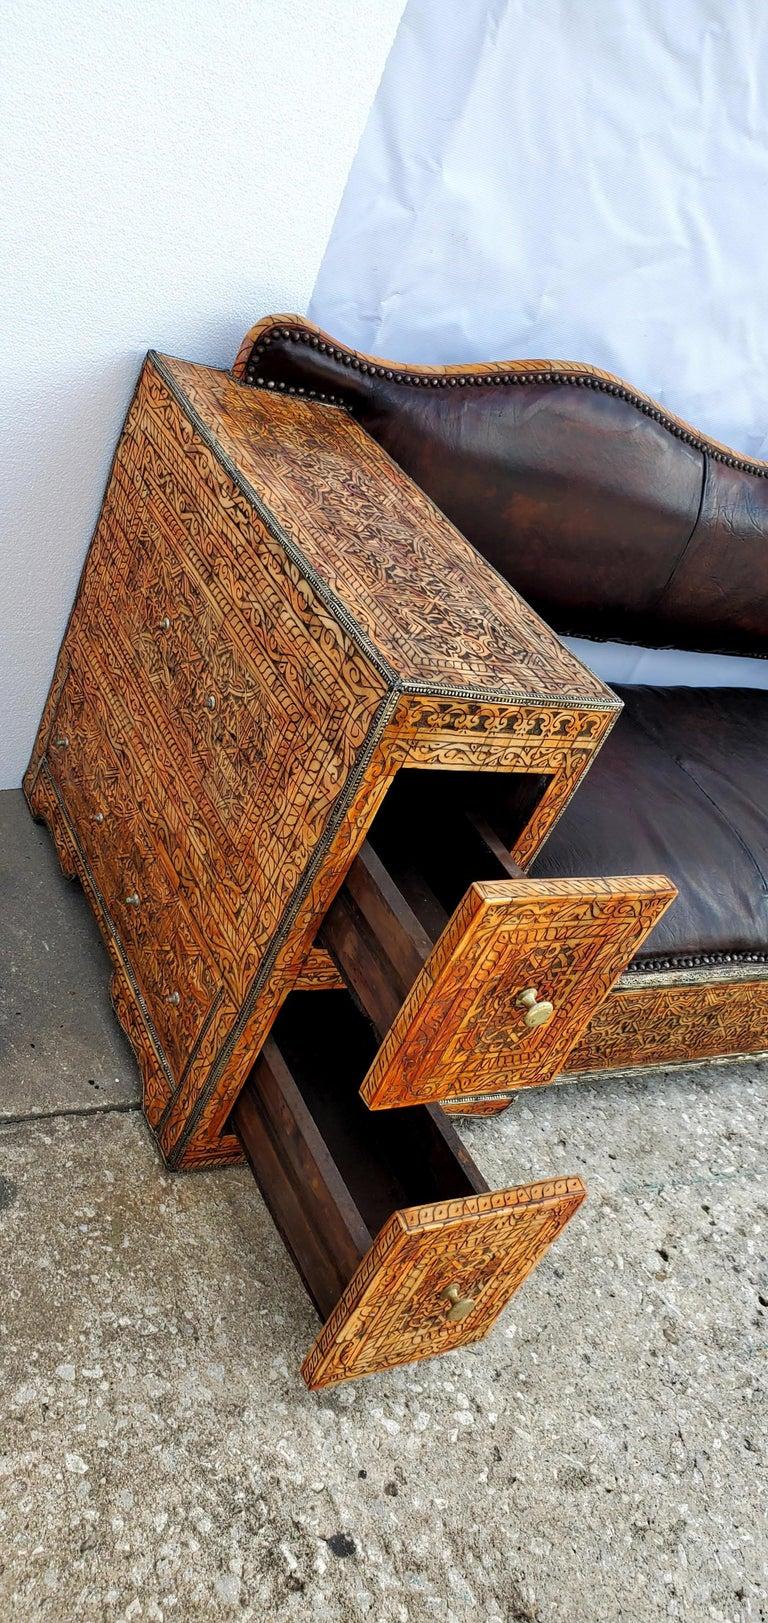 Bone Rare and Unique Moroccan Leather Sofa or Bench For Sale